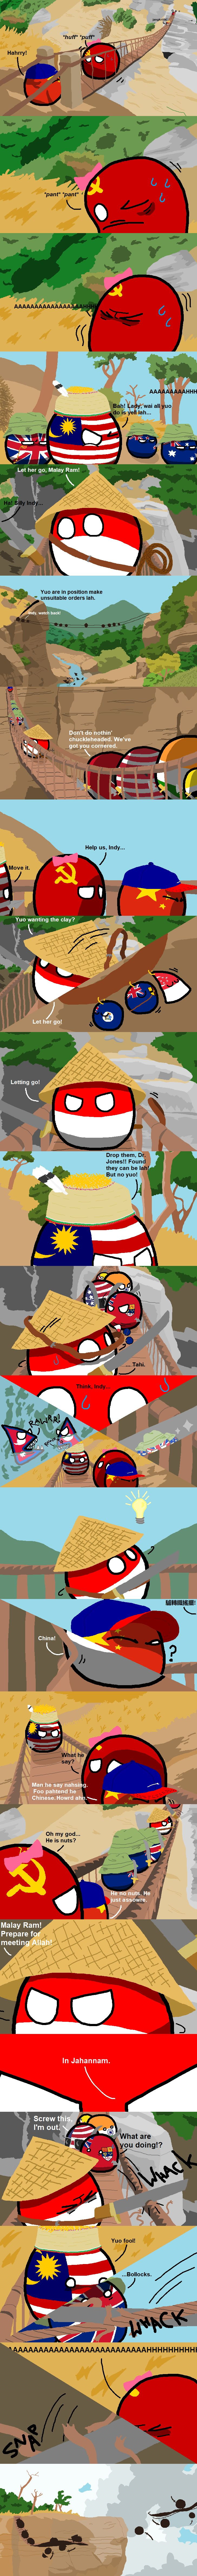 Indonesia Jones and the Temple of Batu   Polandballs Countryballs